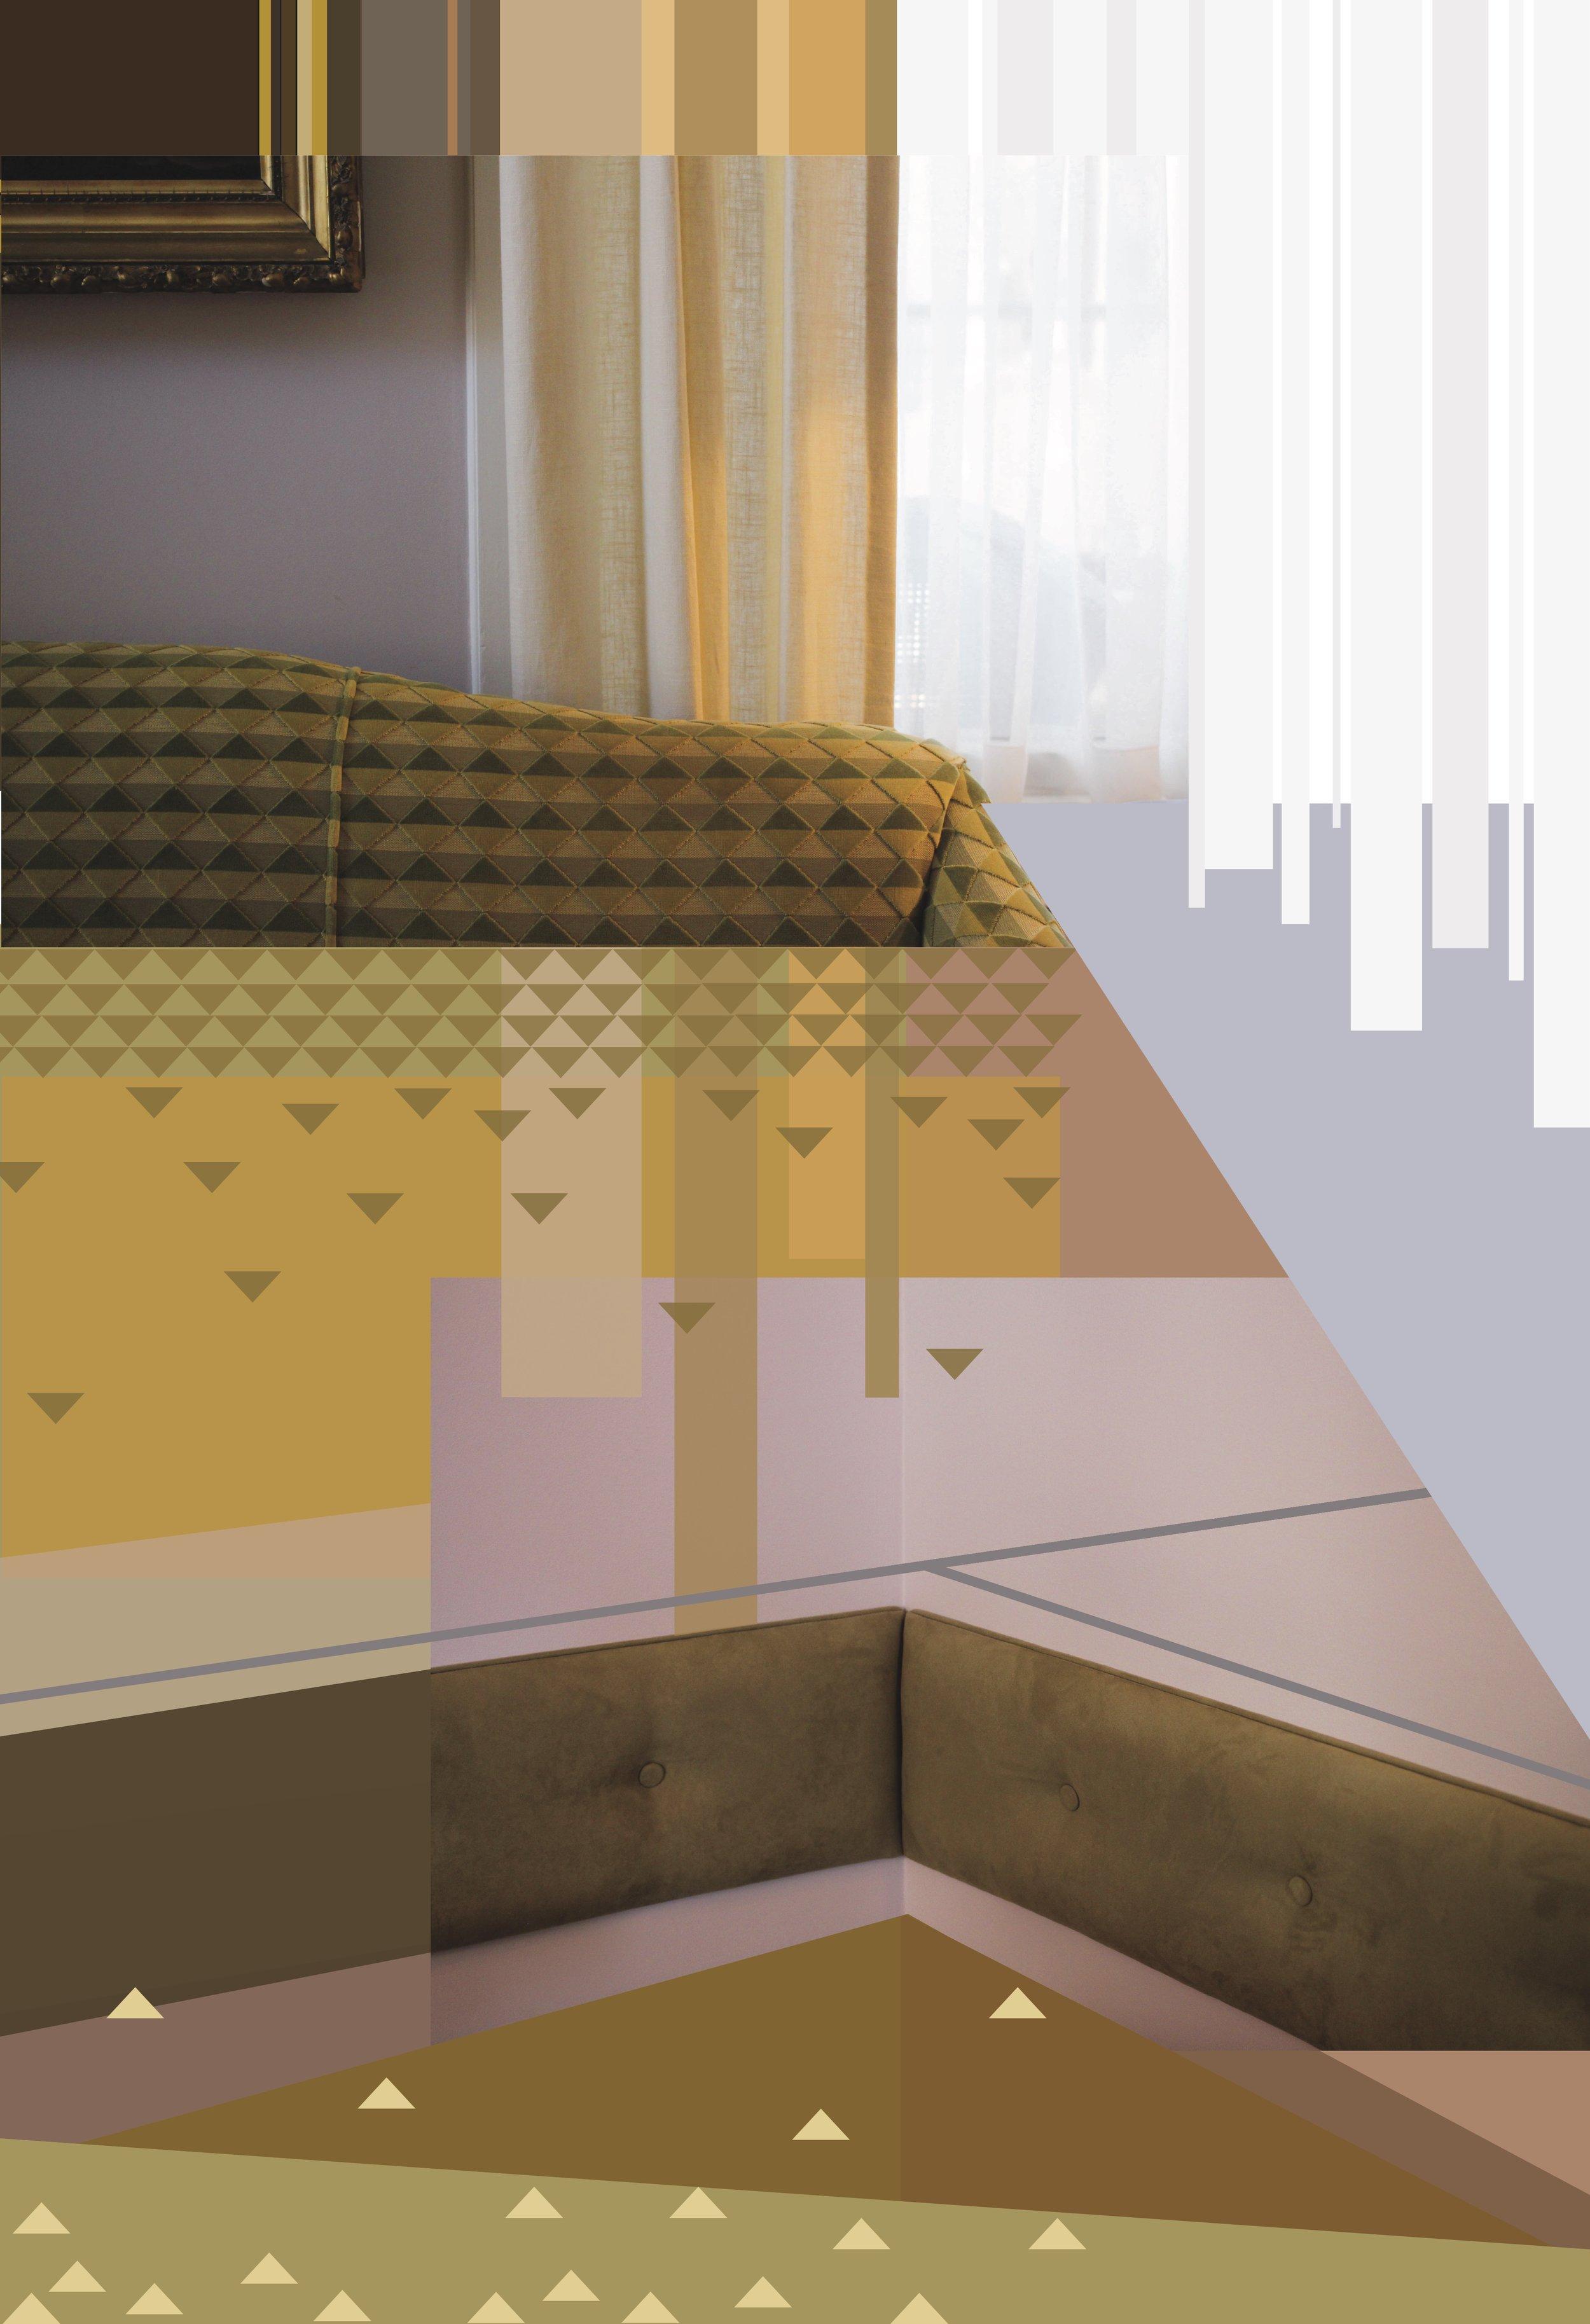 CouchShapeStudy3.jpg